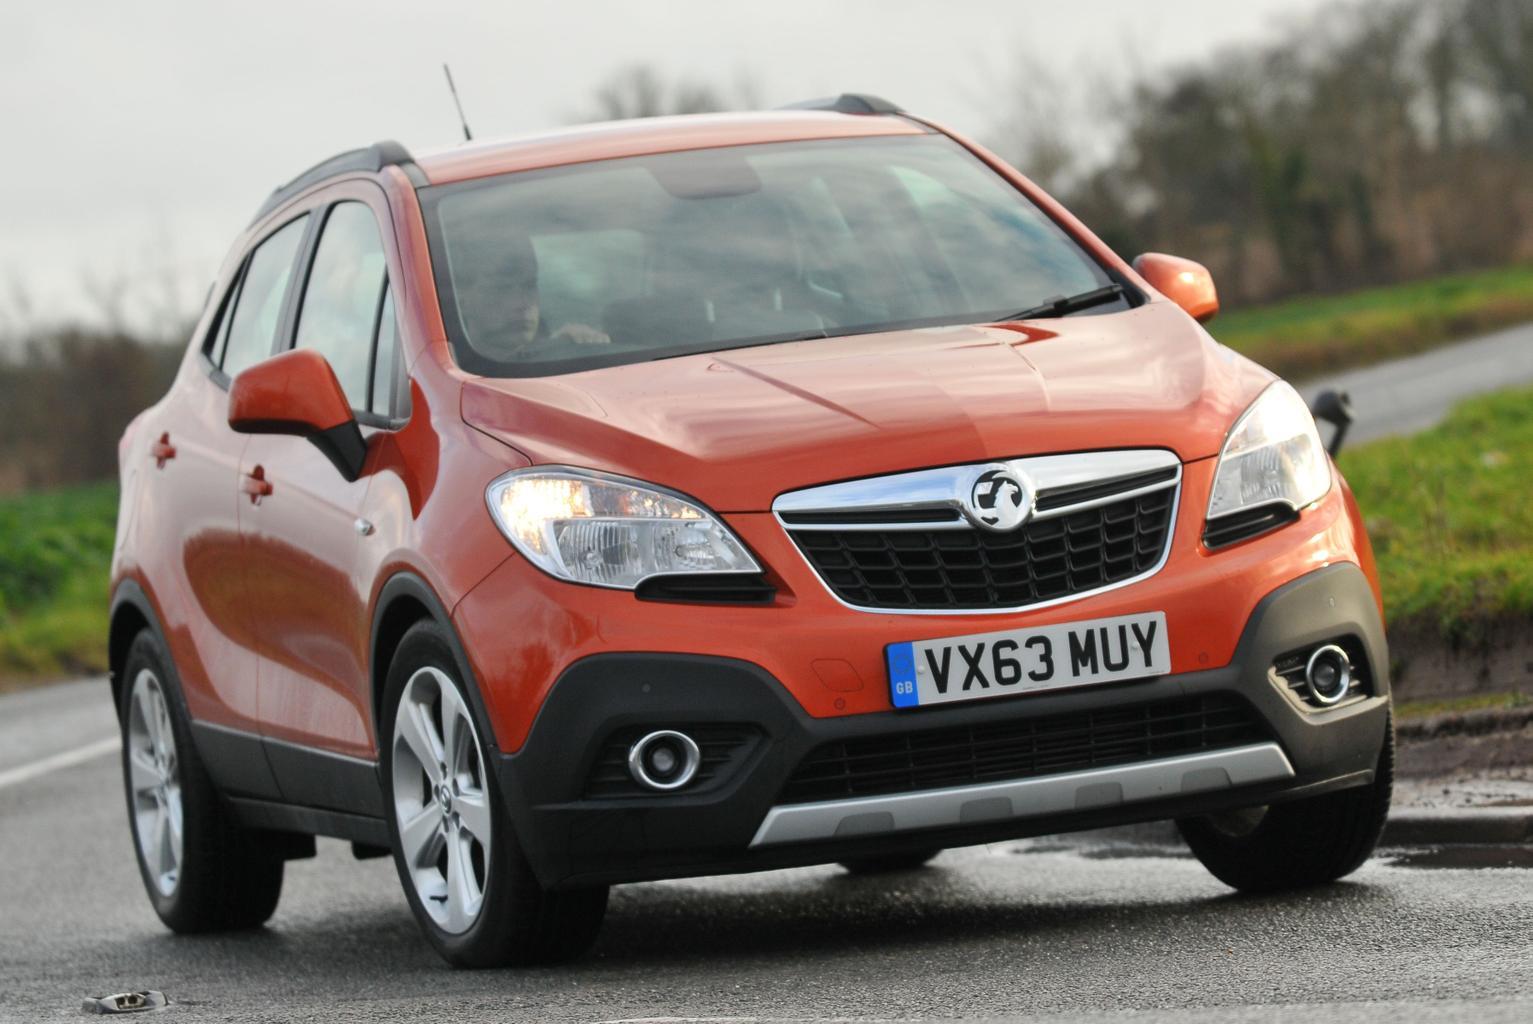 Slow down in UK car market good news for bargain hunters